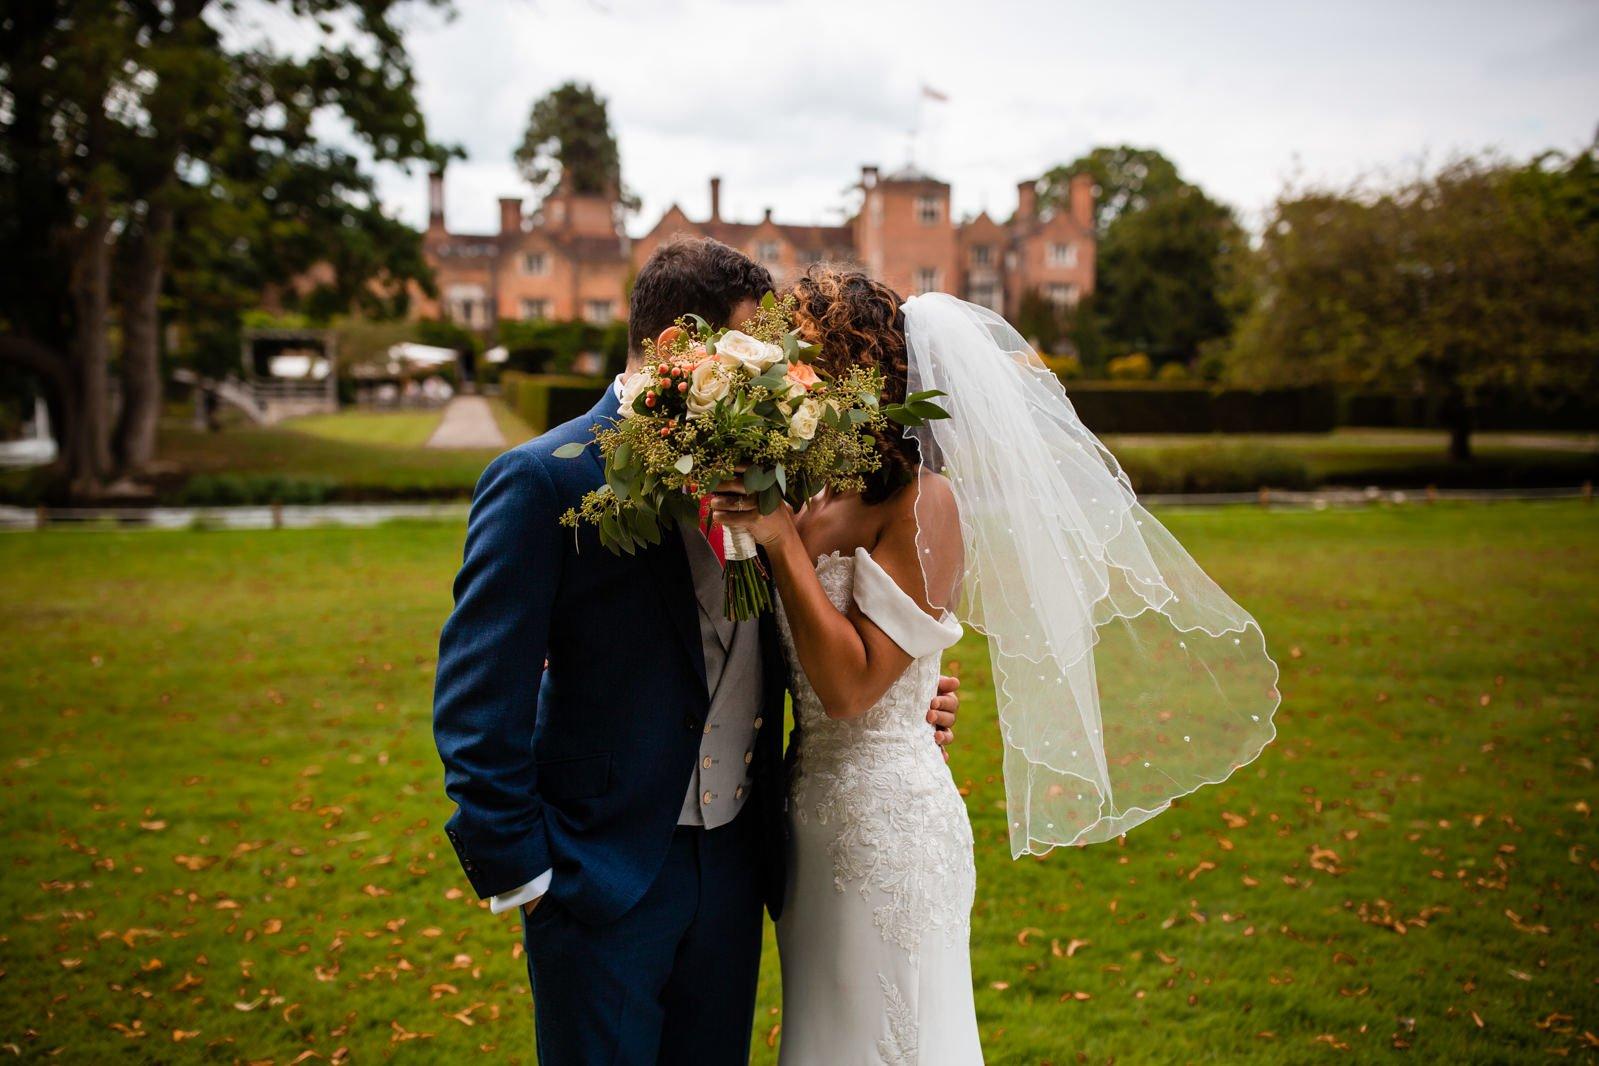 best wedding photos of 2019 5